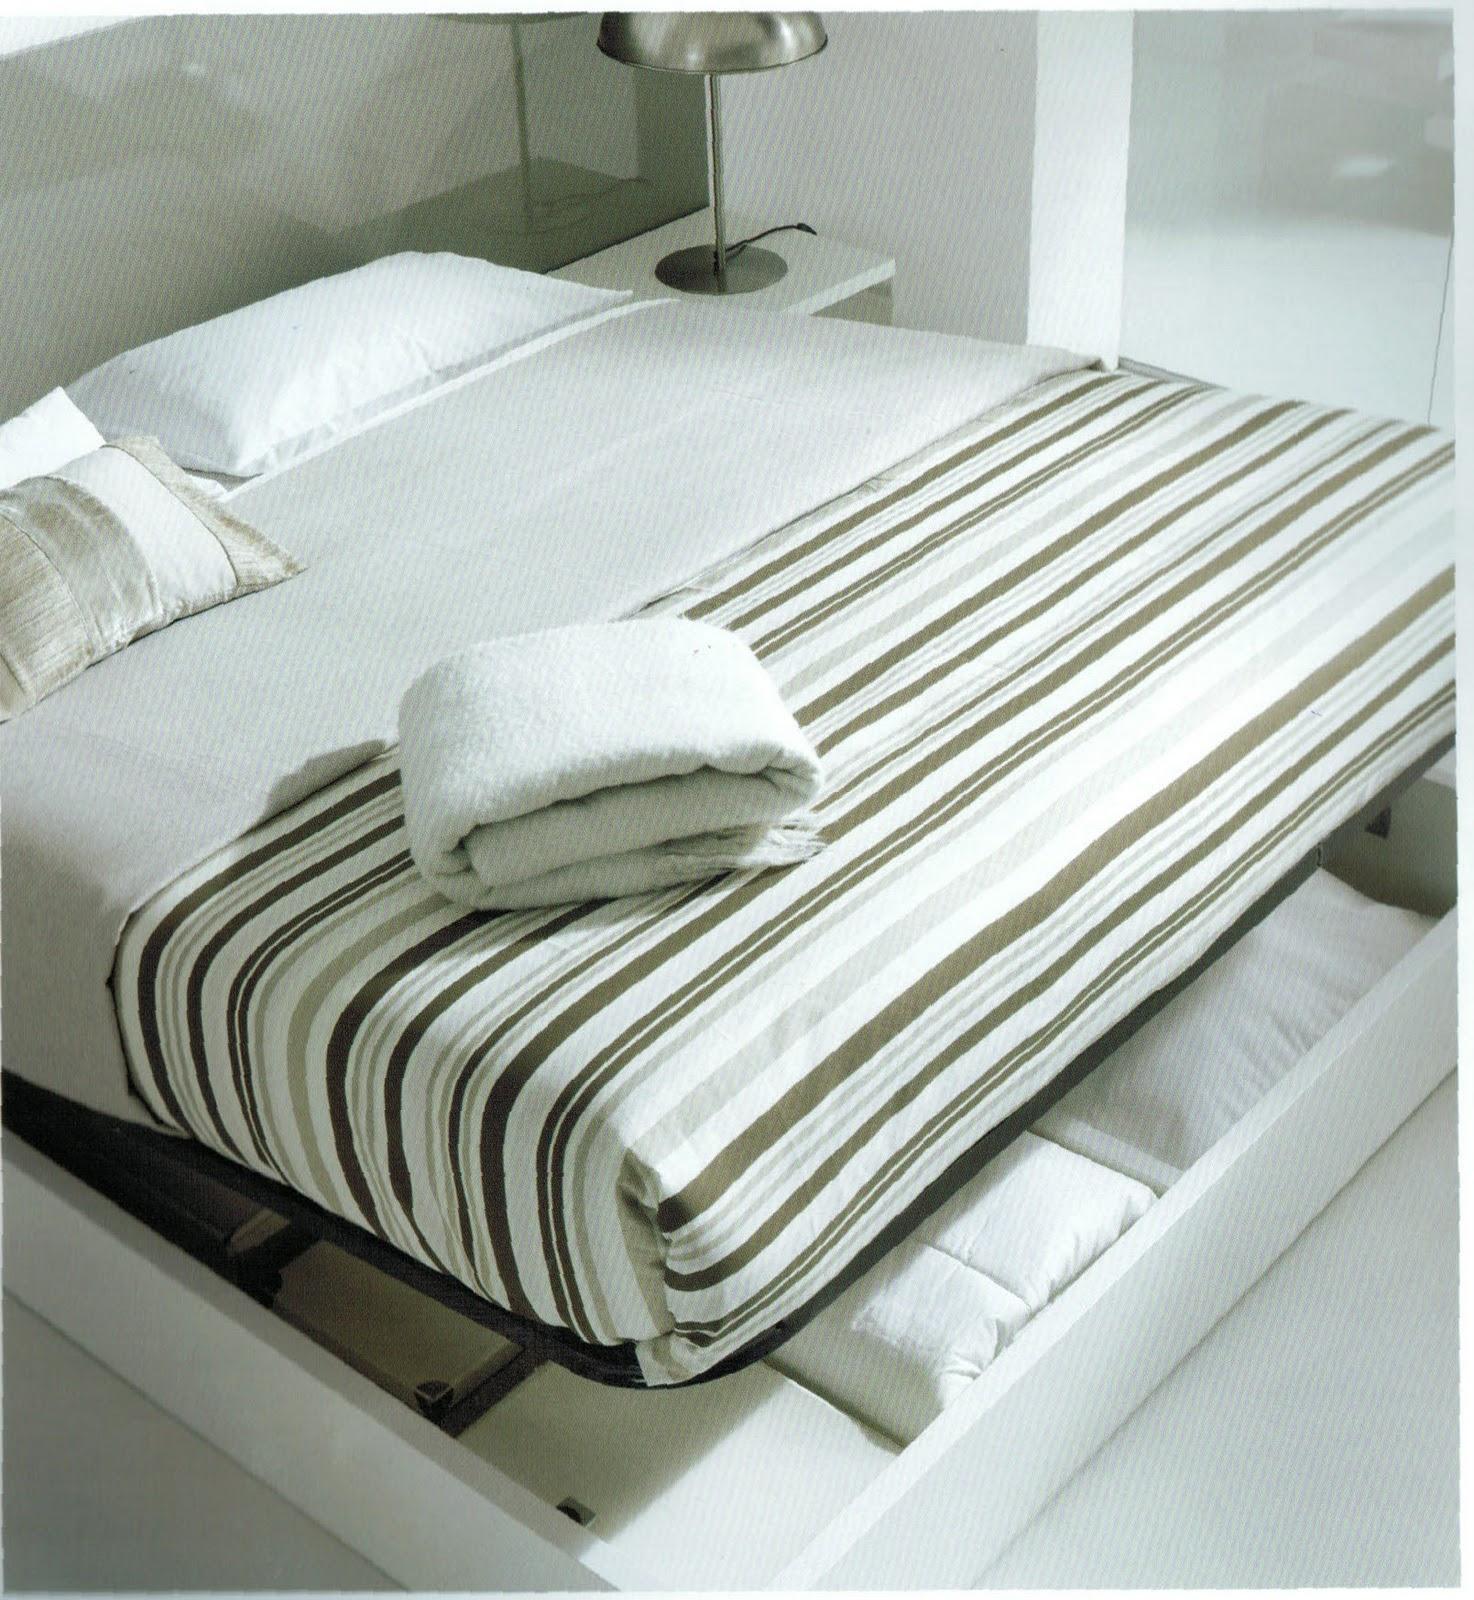 Muebles Hermanos Vaquer - Natigarcia Interiorismo Y Decoraci N[mjhdah]http://3.bp.blogspot.com/-GrqJUGzWwqI/TsBAzw6WJjI/AAAAAAAAADg/WEA7geKDc0c/s1600/DECORADA.JPG